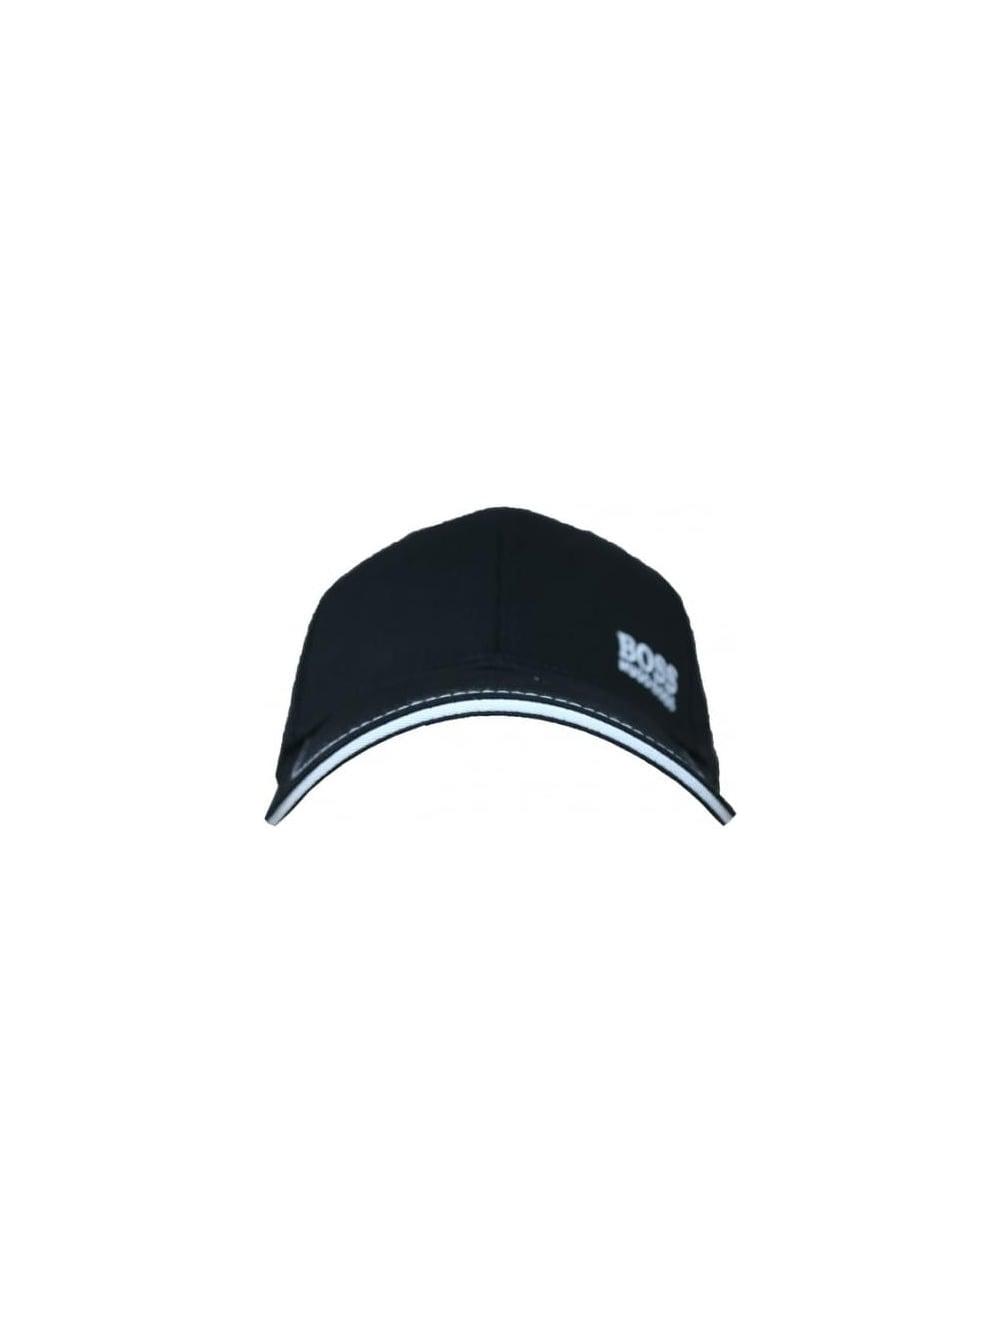 HUGO BOSS Green Cap 1 in Black White - Northern Threads 4c11f1d11434